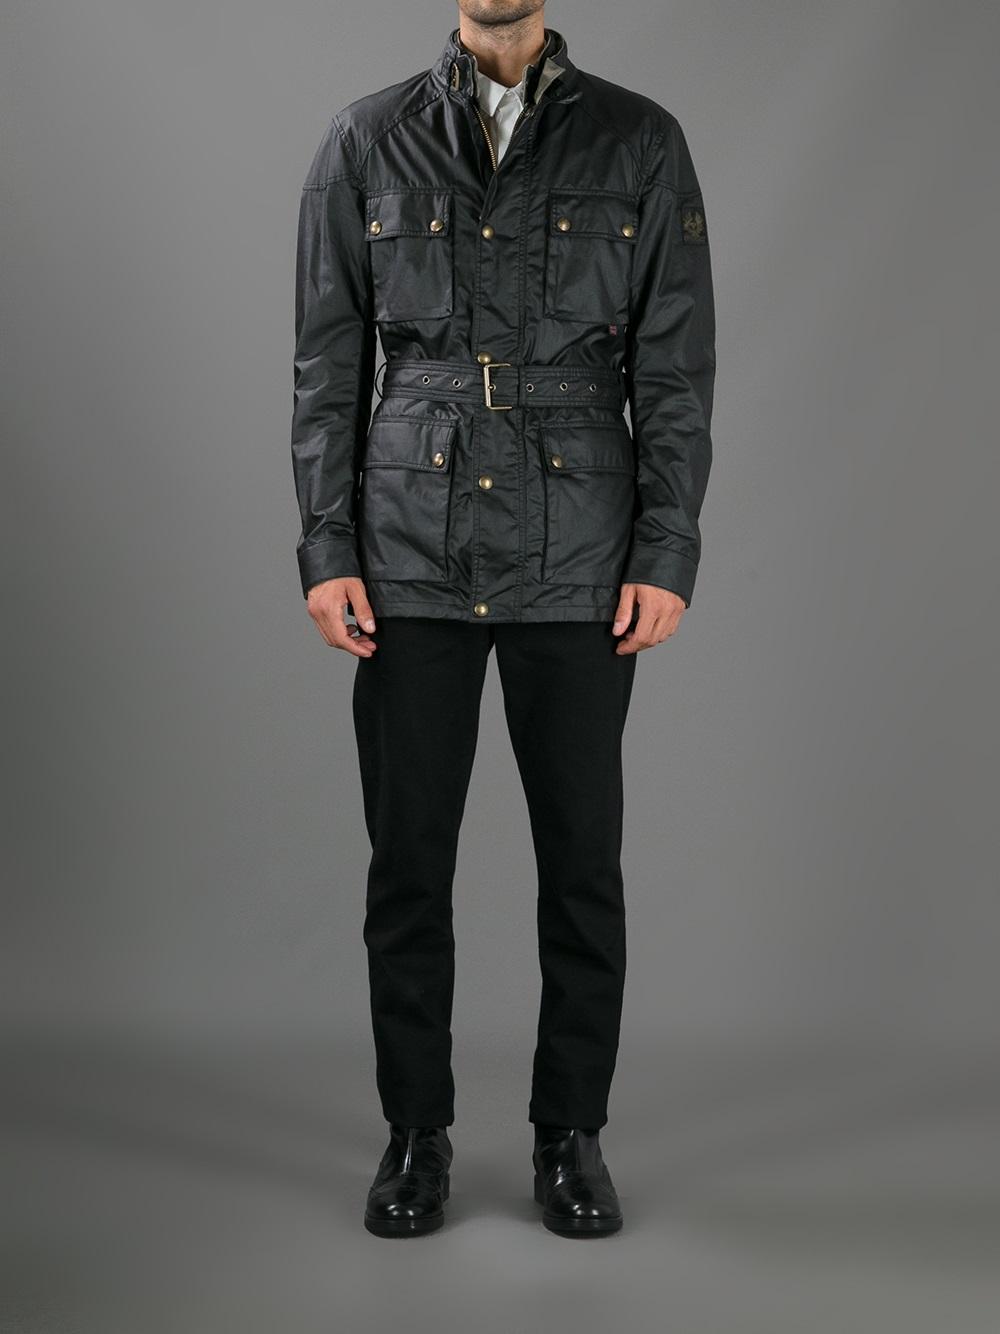 c9c9edf28a Belstaff Streetmaster Jacket in Black for Men - Lyst